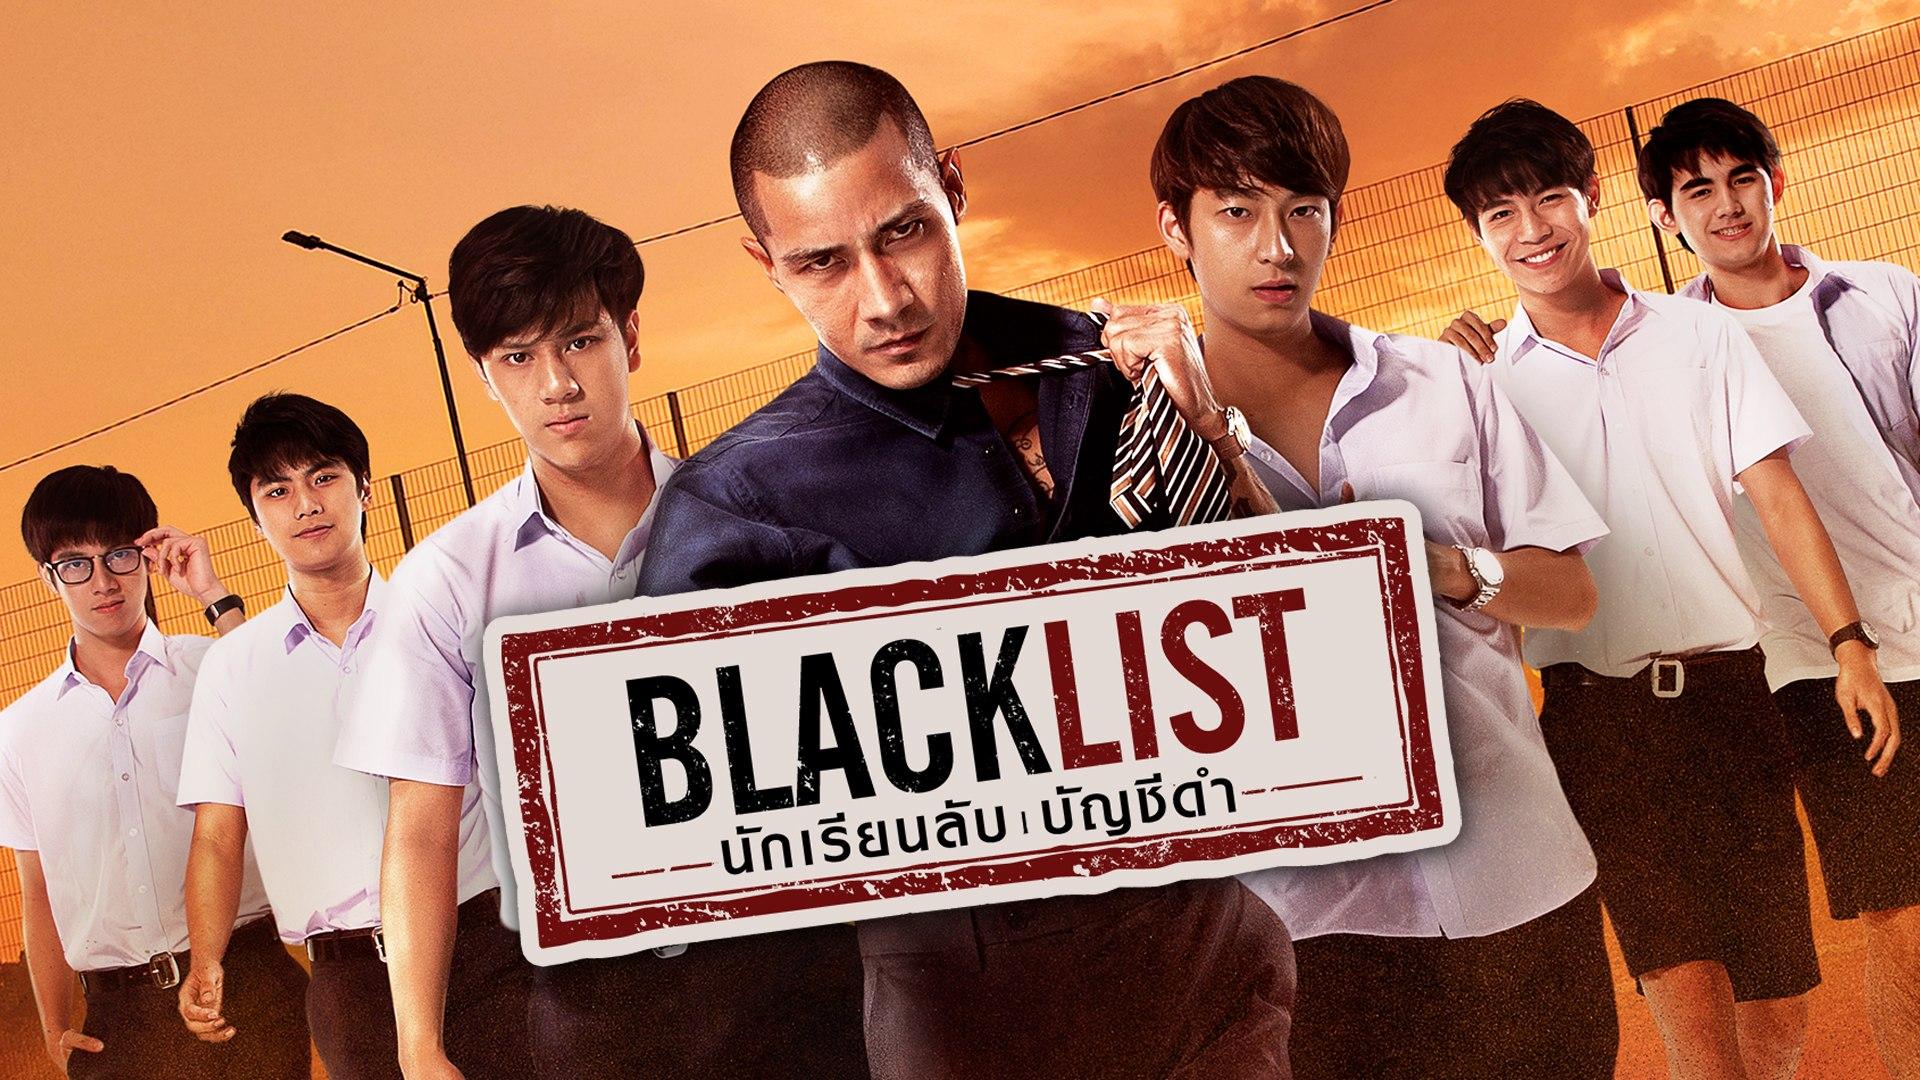 Blacklist นักเรียนลับ บัญชีดำ [Official Trailer]